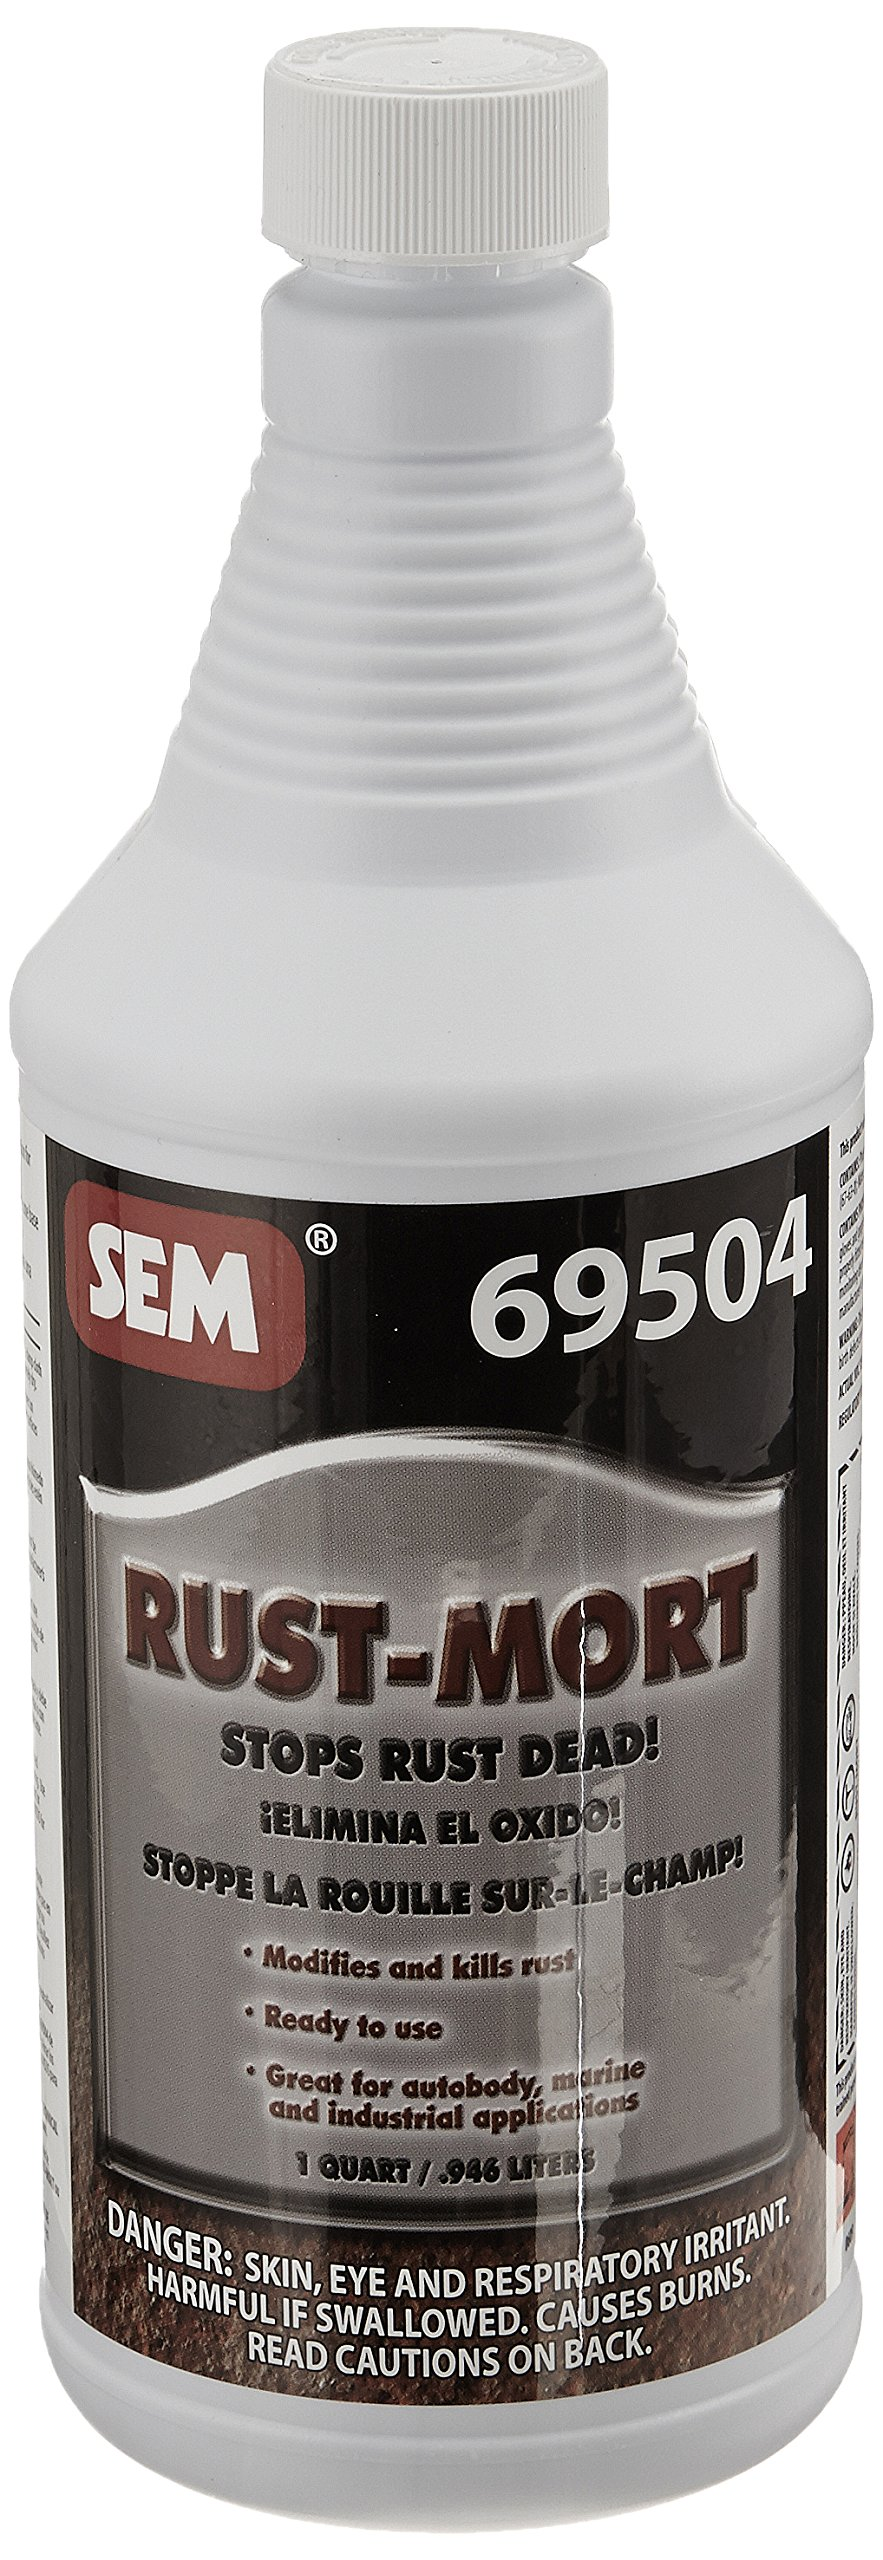 SEM 69504 Rust Mort - 1 Quart